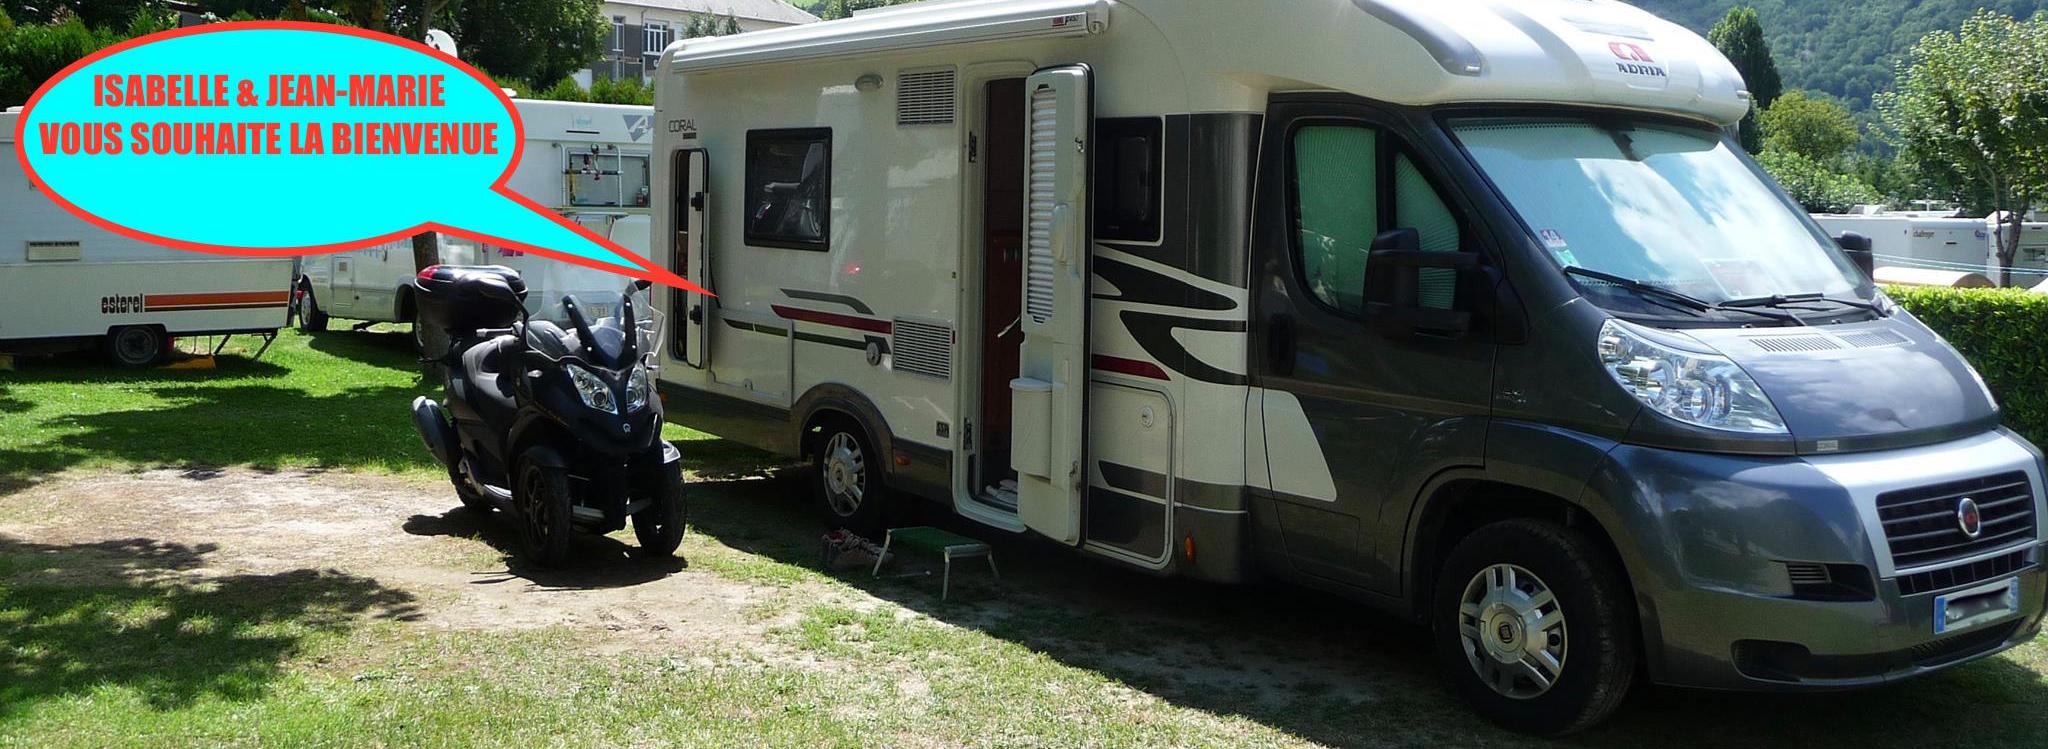 Ballades En Camping-Car Isa & J-Marie